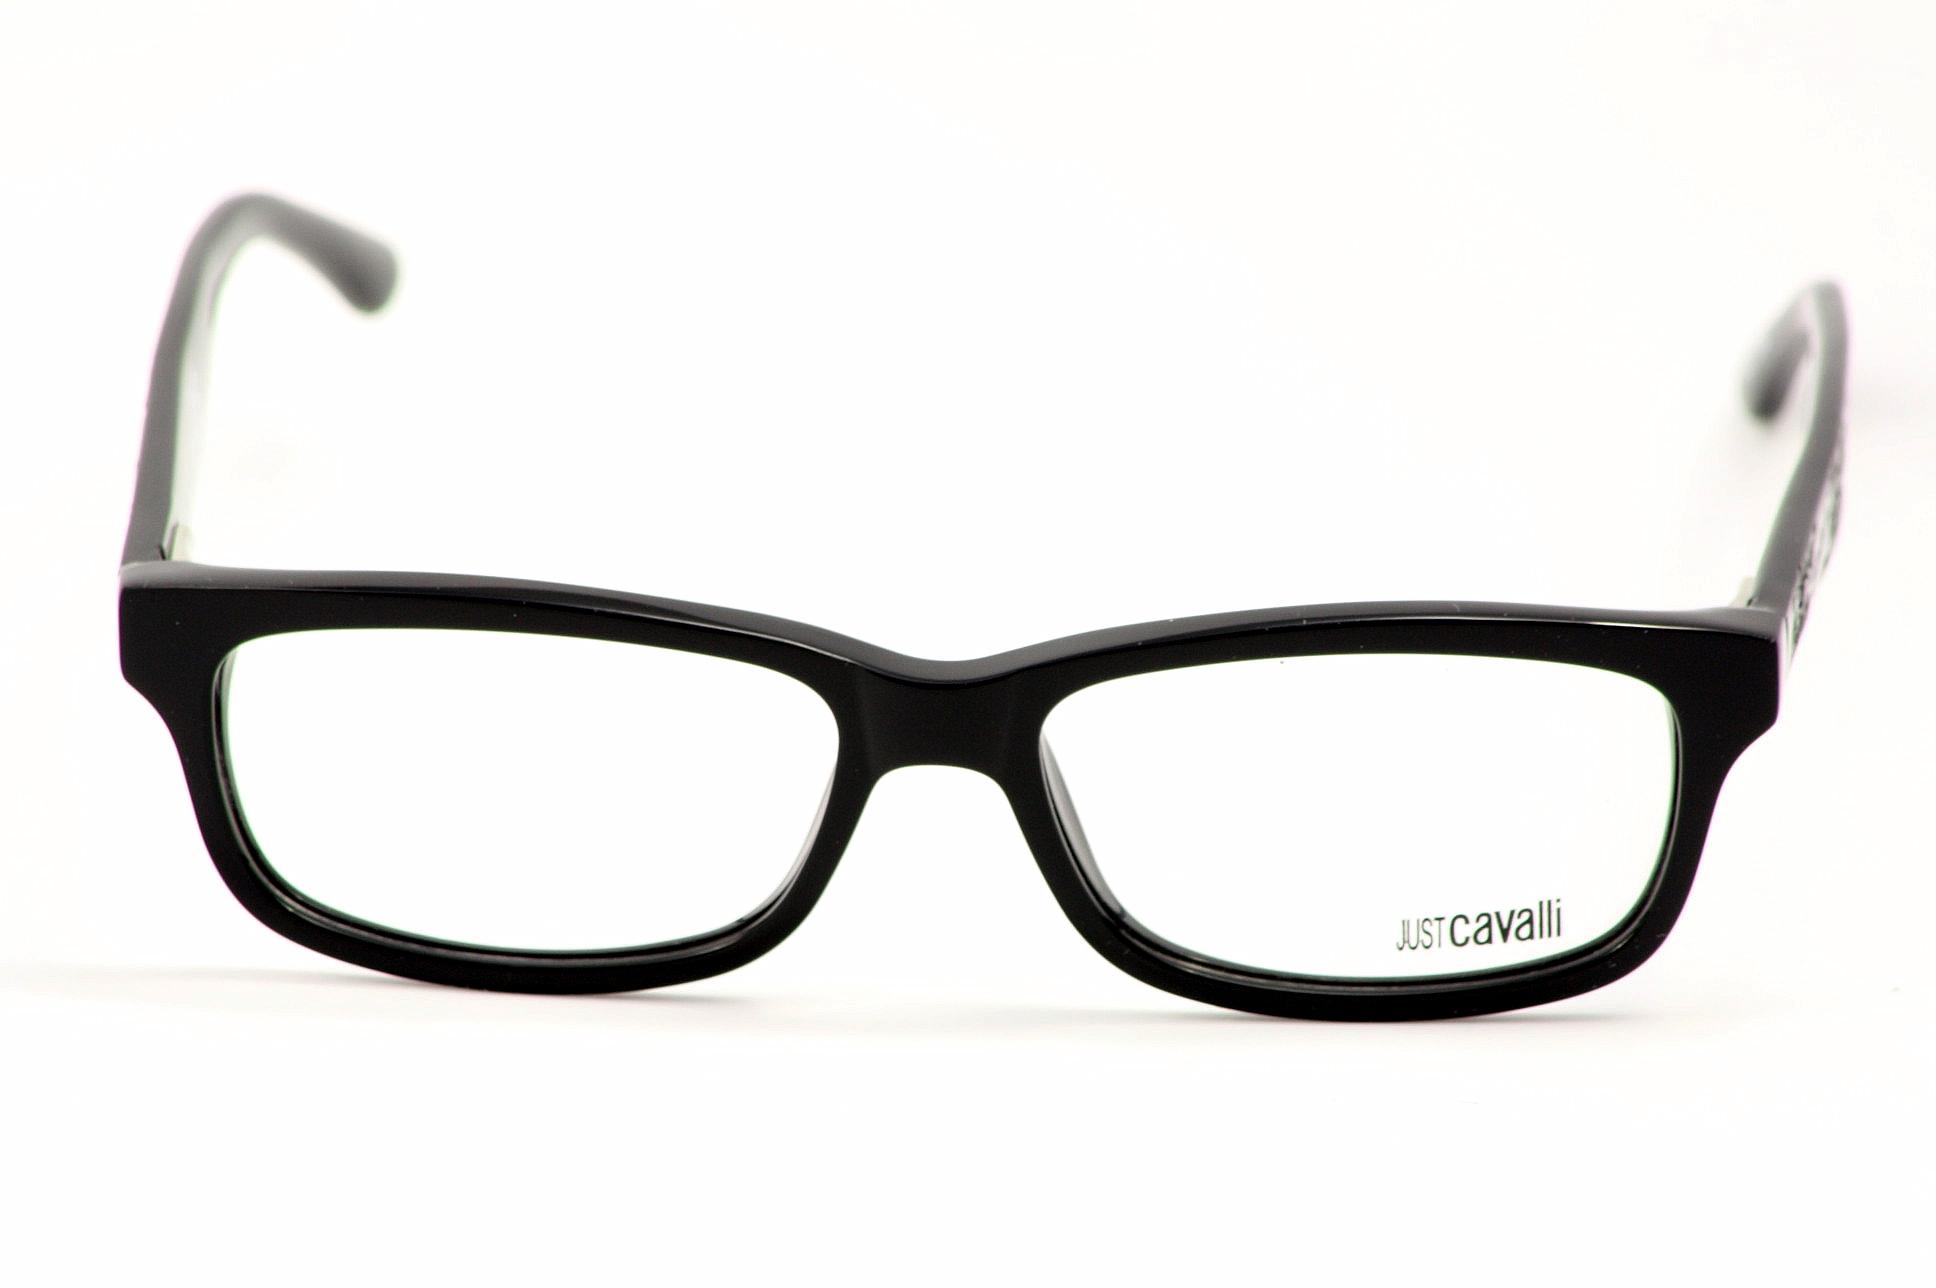 Just frames for glasses - Just Cavalli Eyeglasses Jc361 Black Optical Frame By Just Cavalli